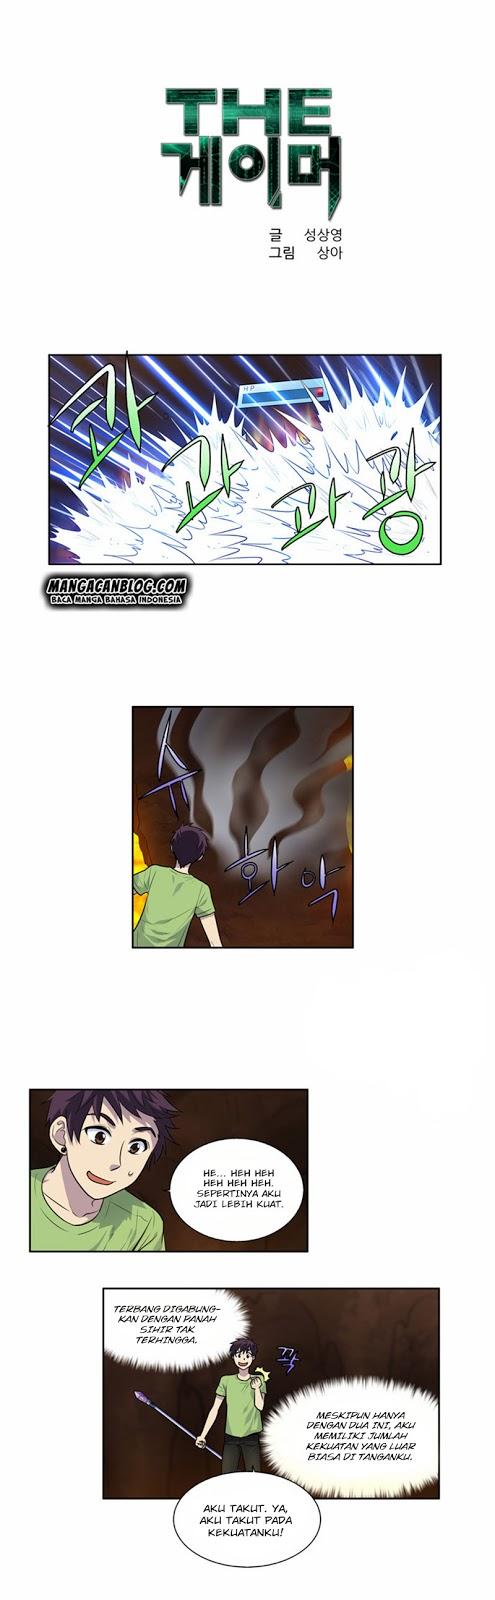 Dilarang COPAS - situs resmi www.mangacanblog.com - Komik the gamer 107 - chapter 107 108 Indonesia the gamer 107 - chapter 107 Terbaru |Baca Manga Komik Indonesia|Mangacan